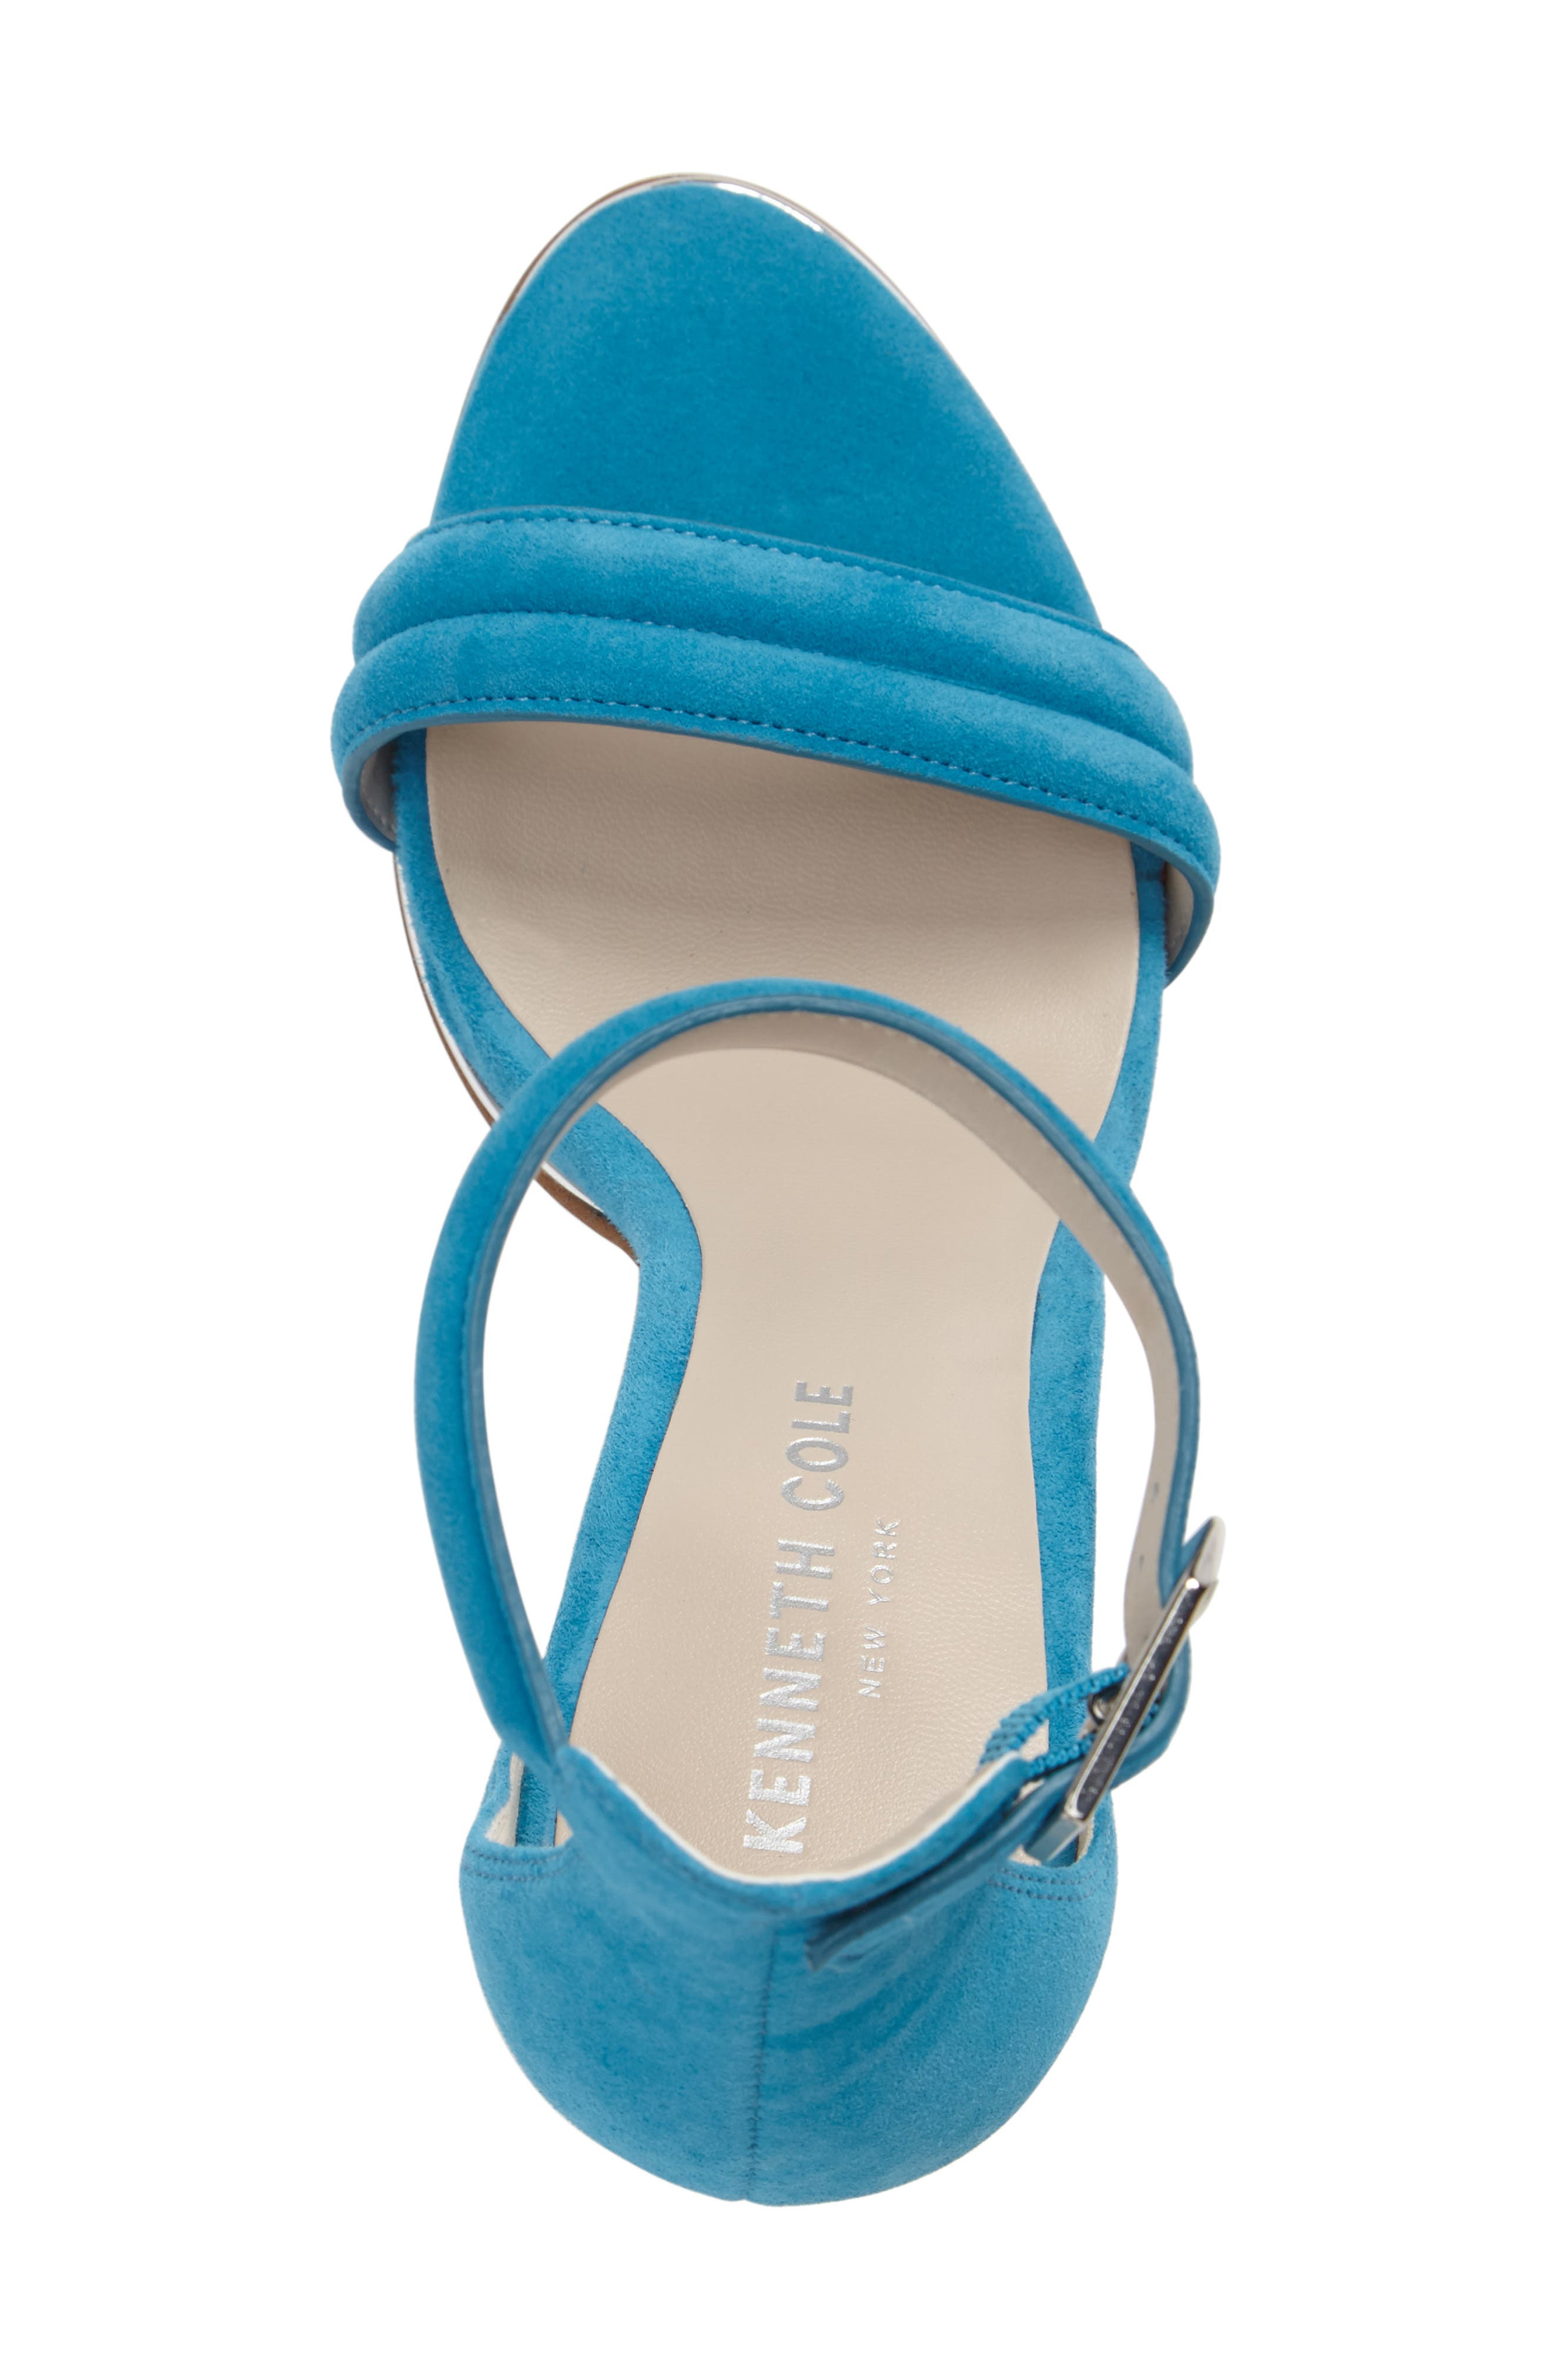 Alternate Image 3  - Kenneth Cole New York 'Brooke' Ankle Strap Sandal (Women)